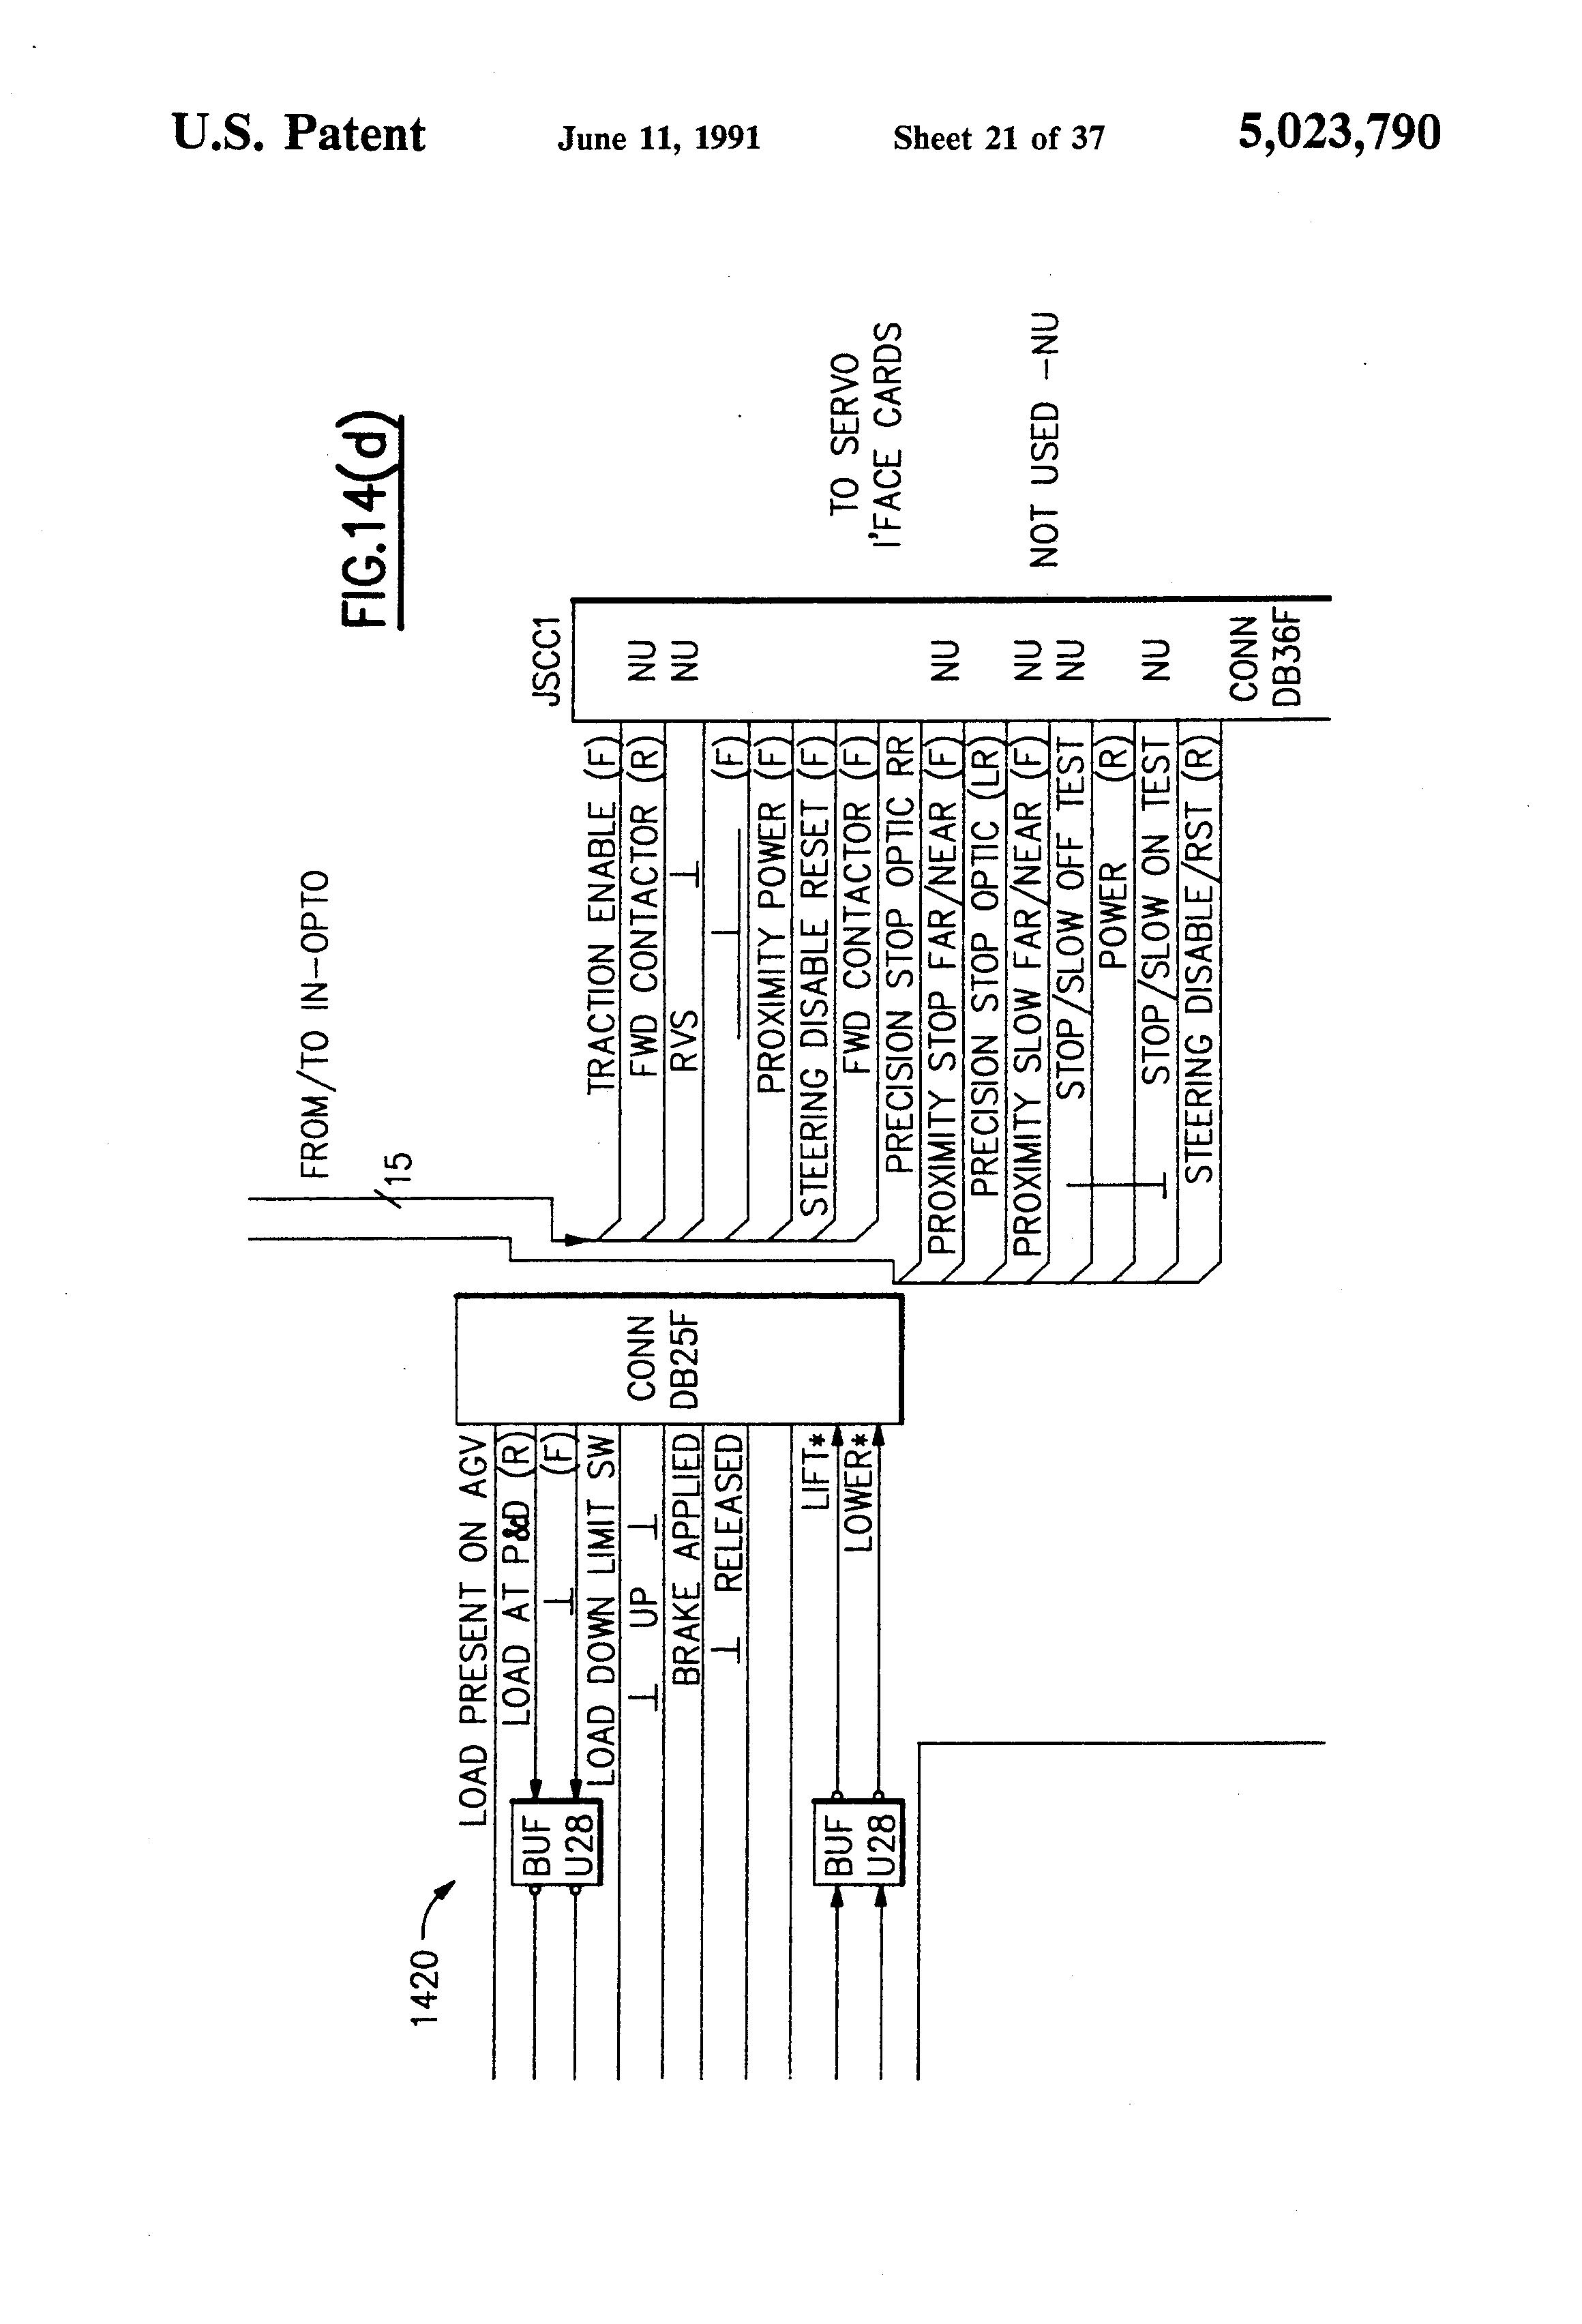 Sew Encoder Wiring Diagram - Wiring Diagram